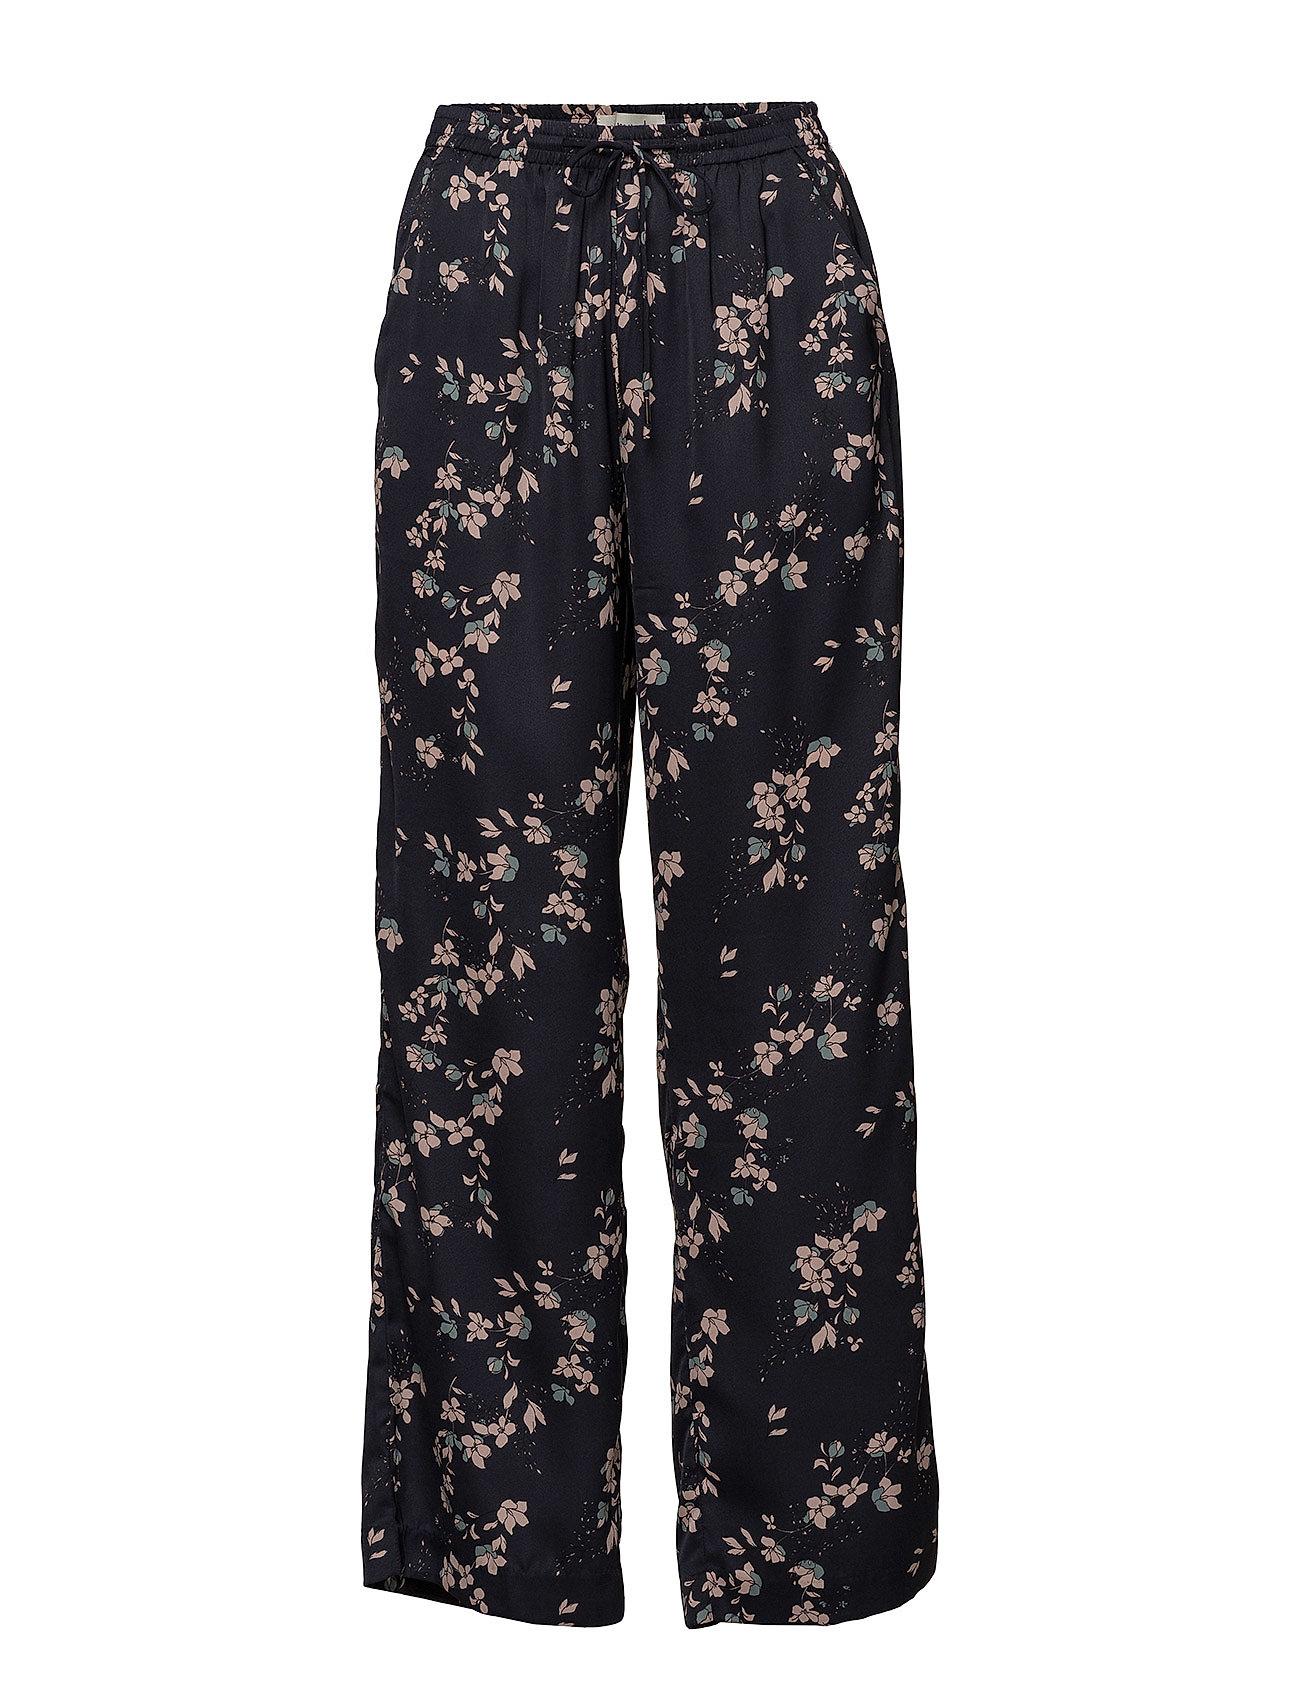 Trousers (Japanese Flower Print) (59.40 €) - Rosemunde -  a1a6ef00c7